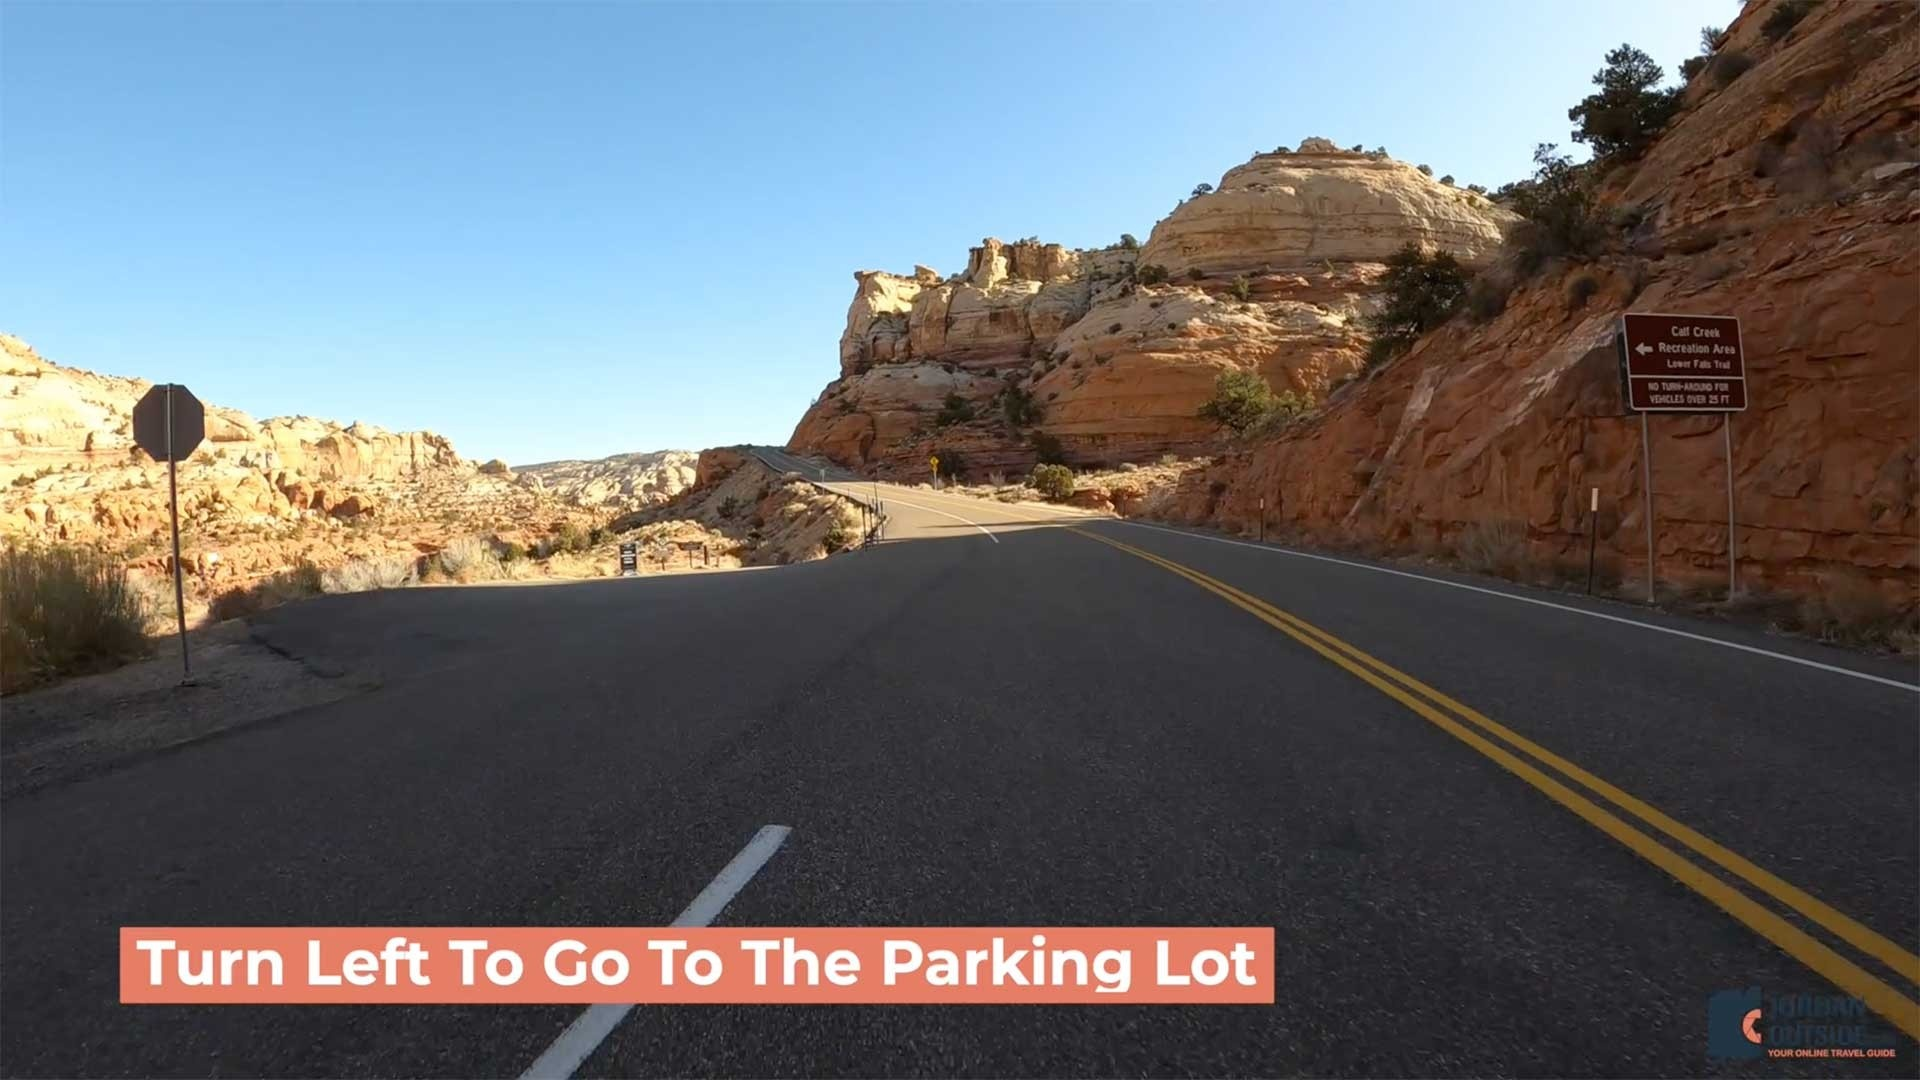 Turn Left into Lower Calf Creek Falls Parking Lot